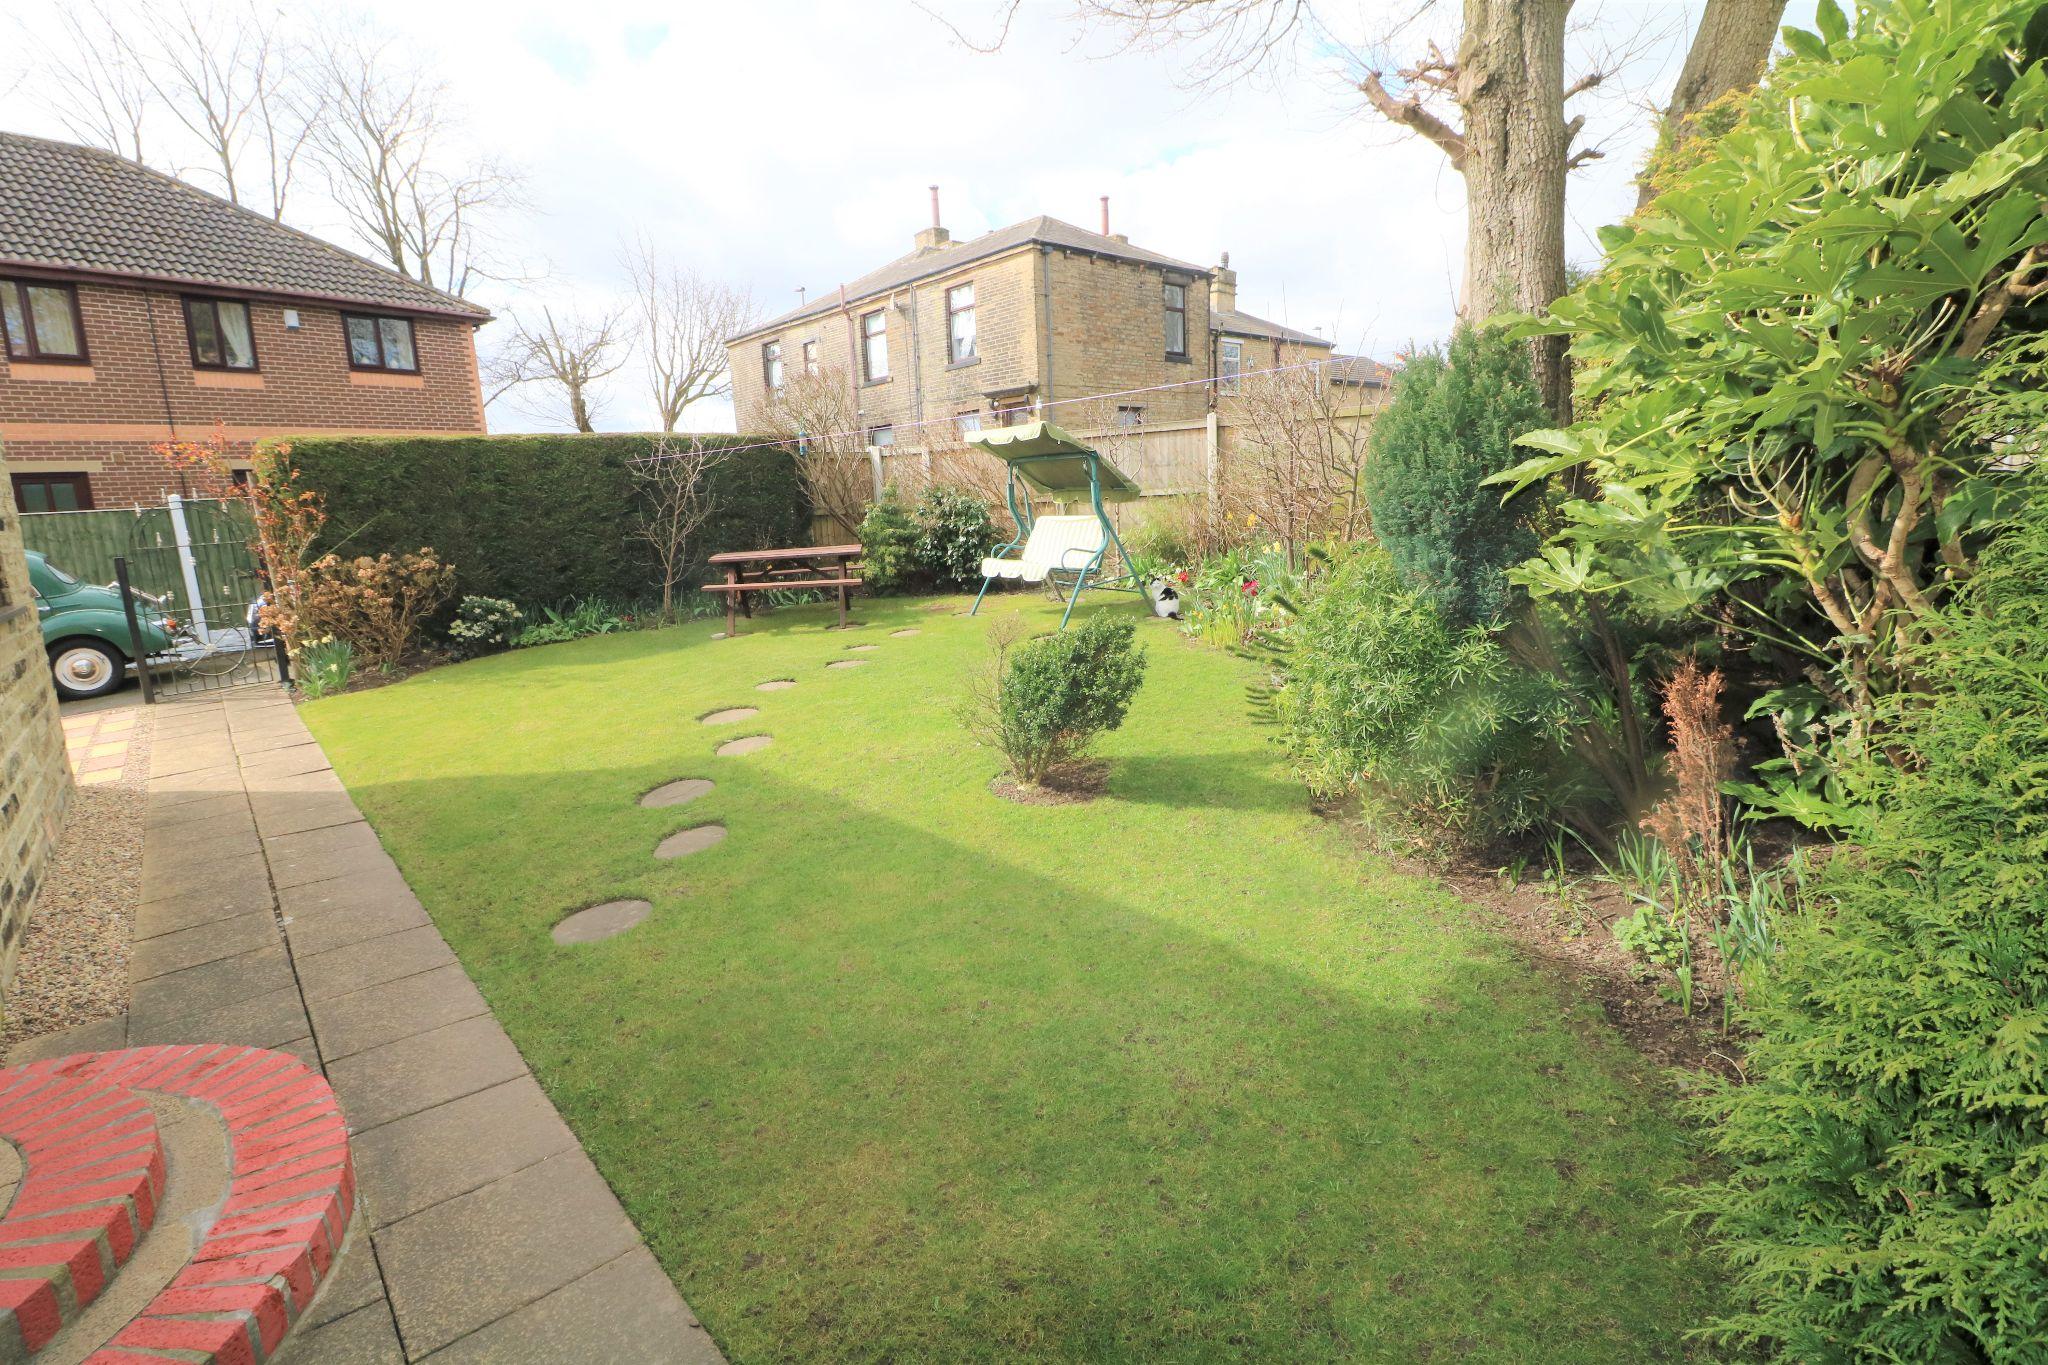 3 Bedroom Detached House For Sale - Garden